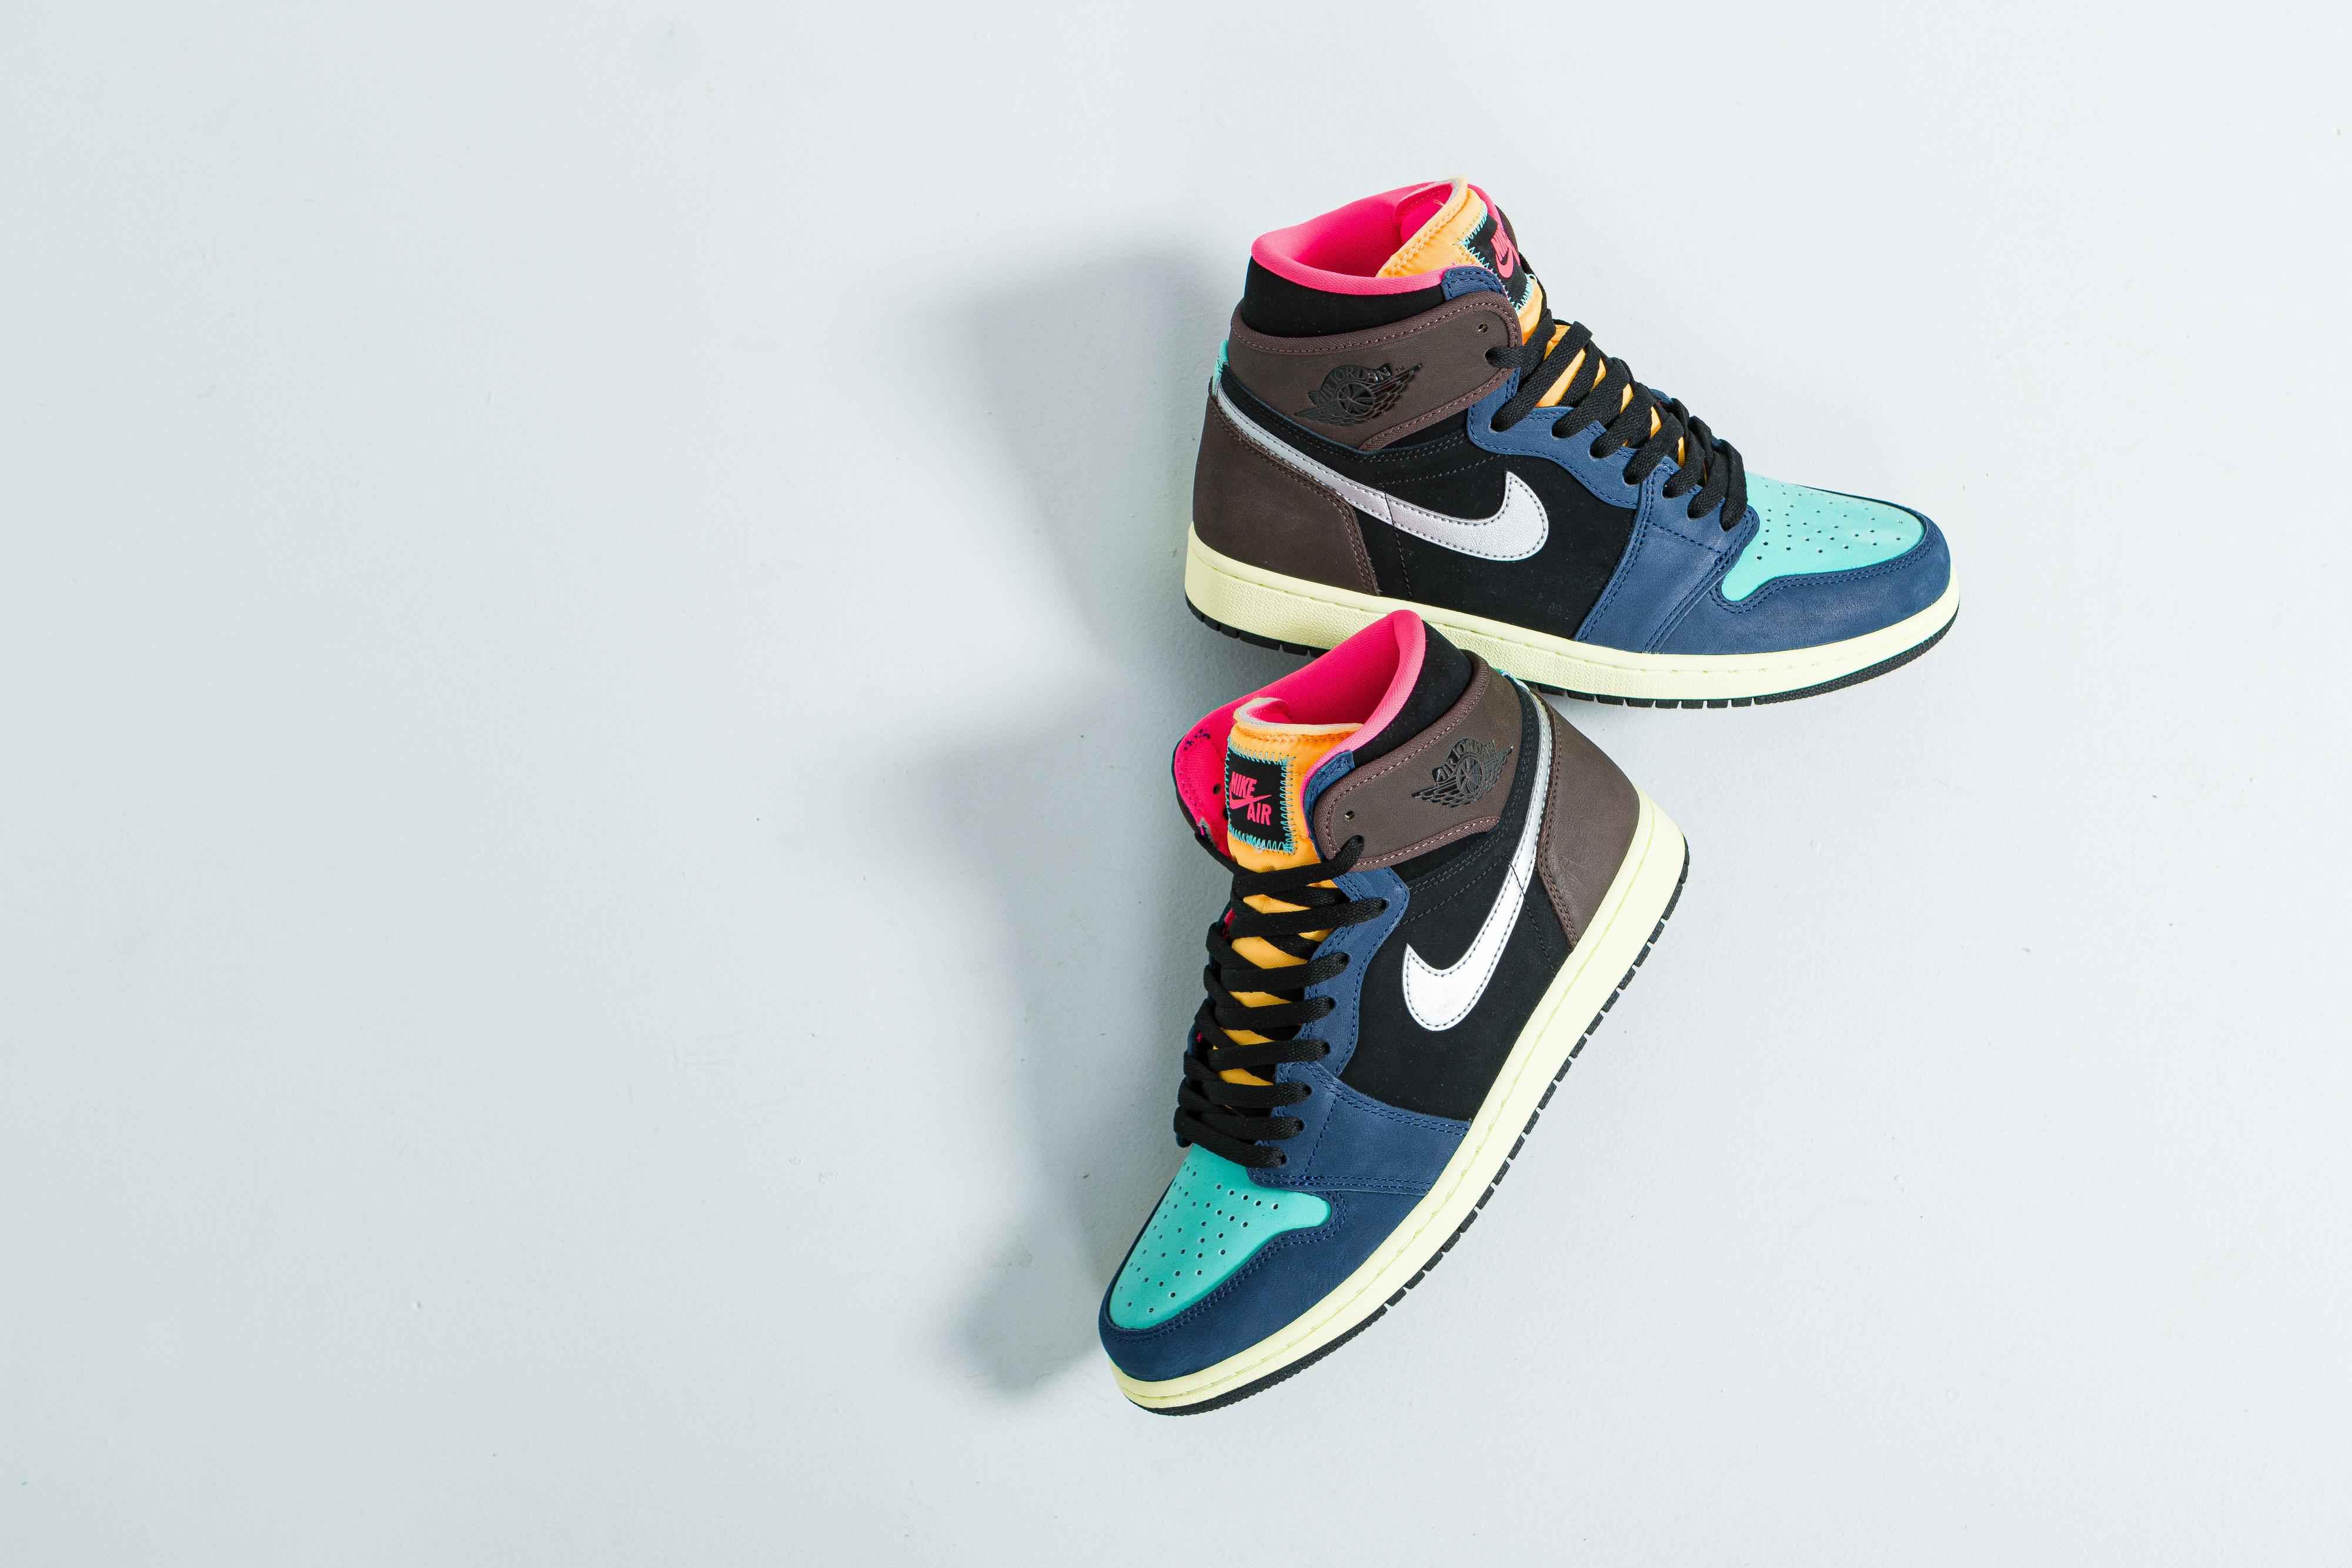 Up There Launches - Nike Air Jordan 1 Retro High OG - Baroque Brown/Black-Laser Orange-Racer Pink